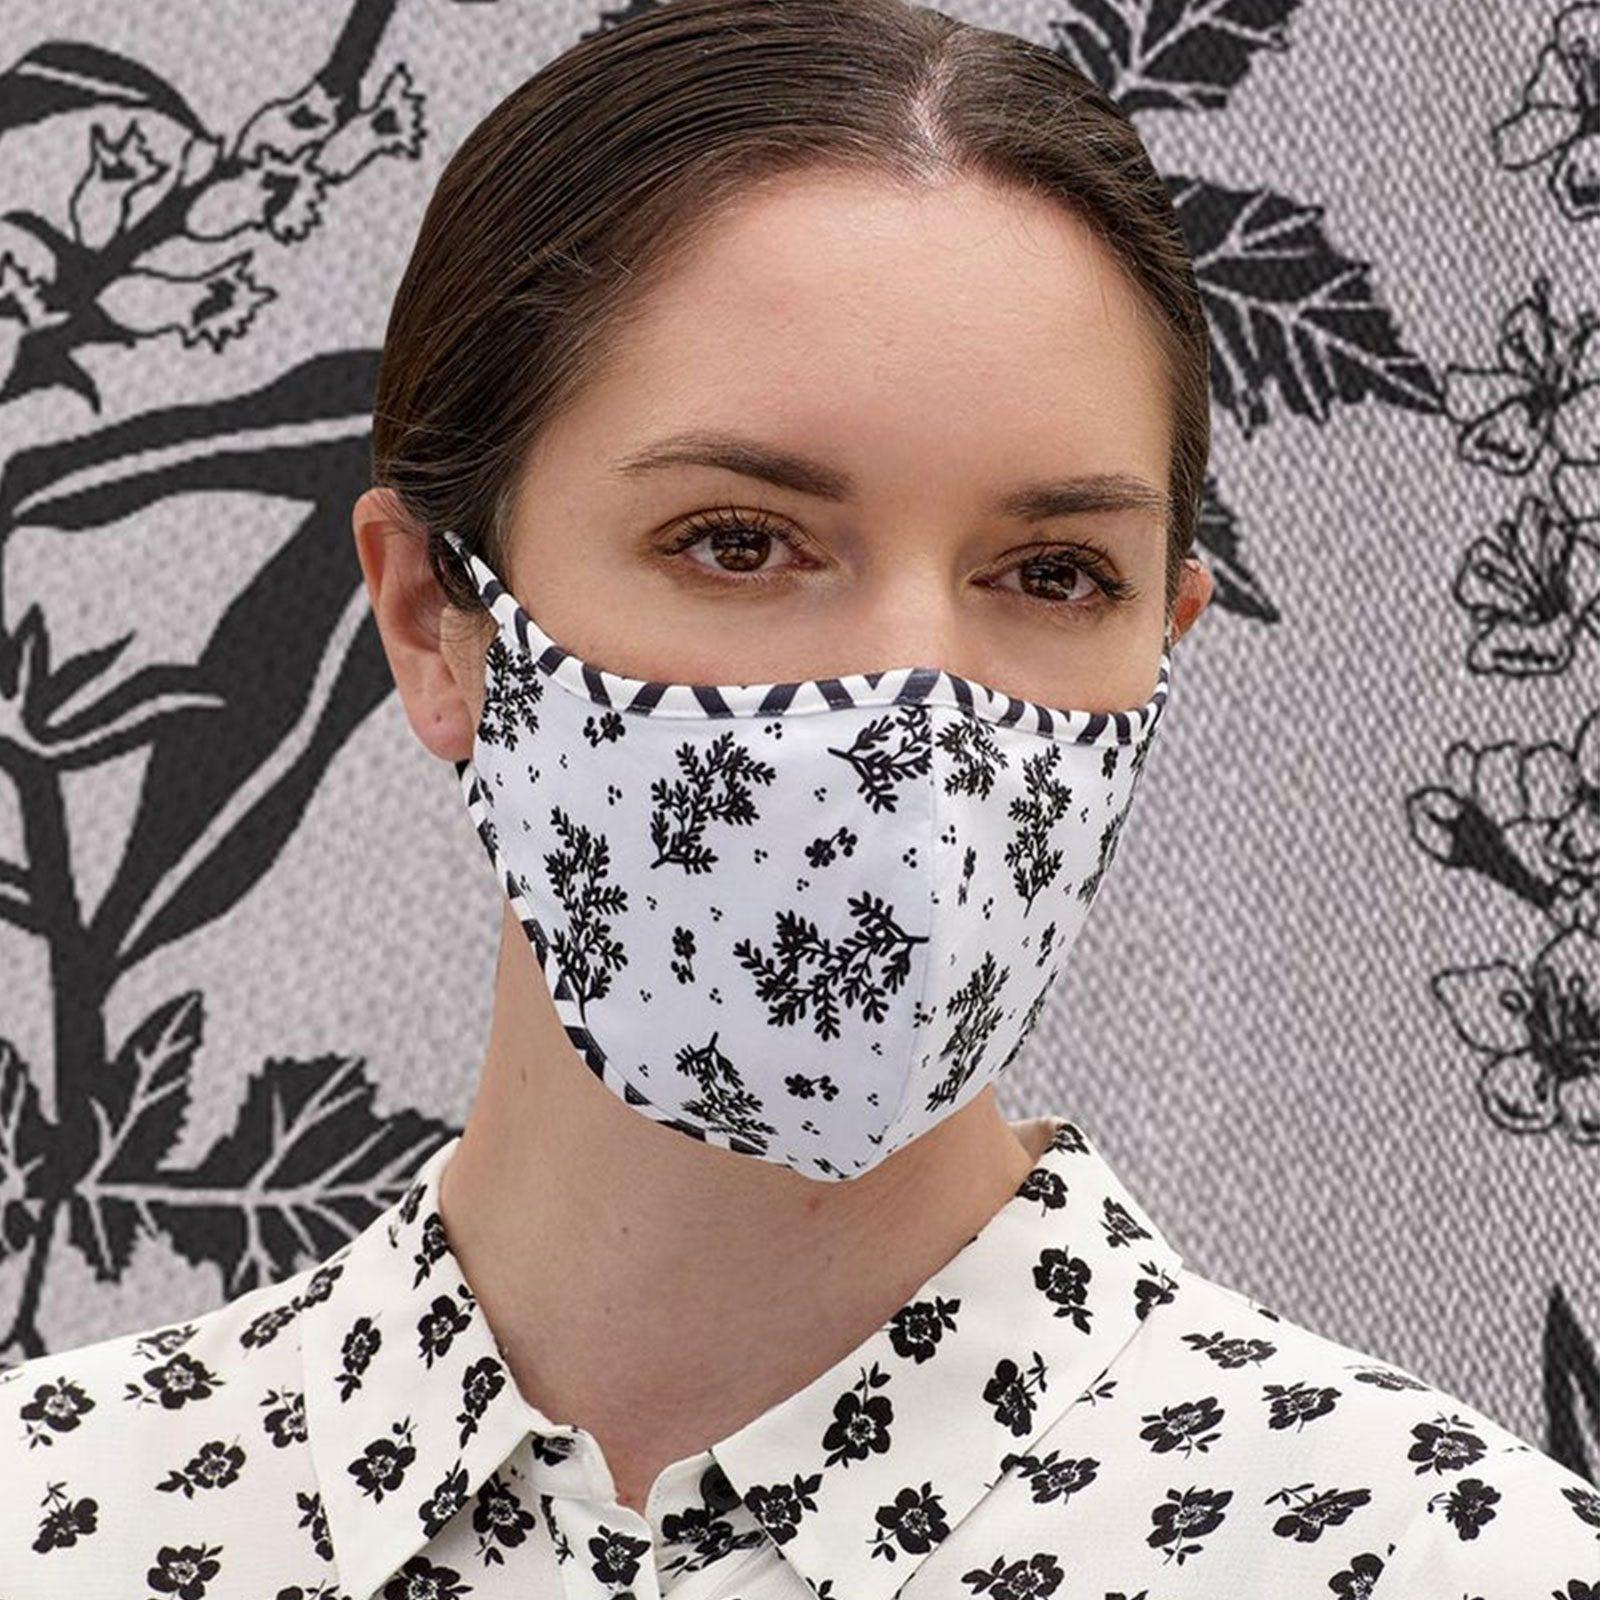 VIDA Artist Print Limited Edition Mask